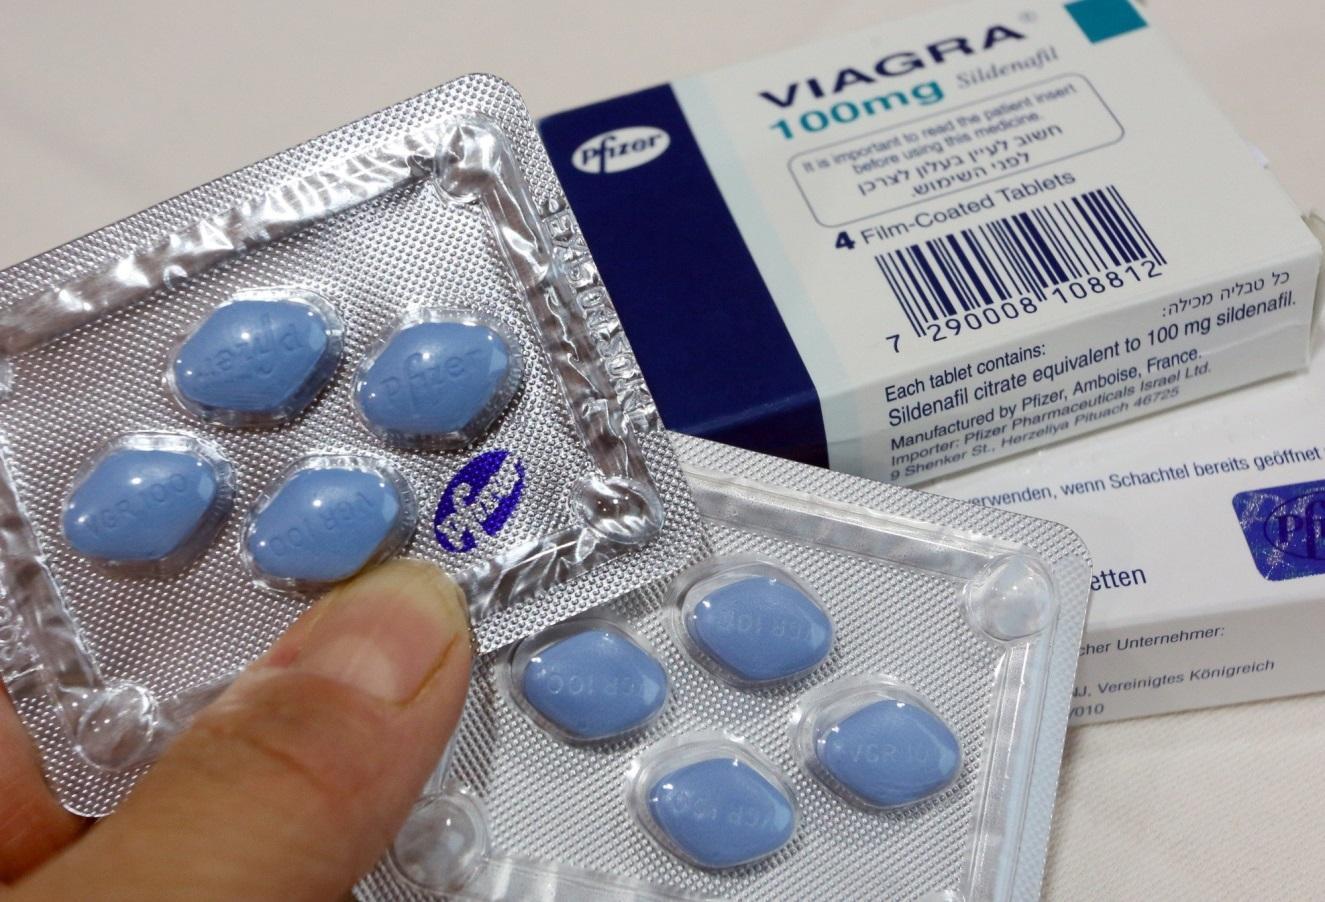 Viagra Pills from Pfizer